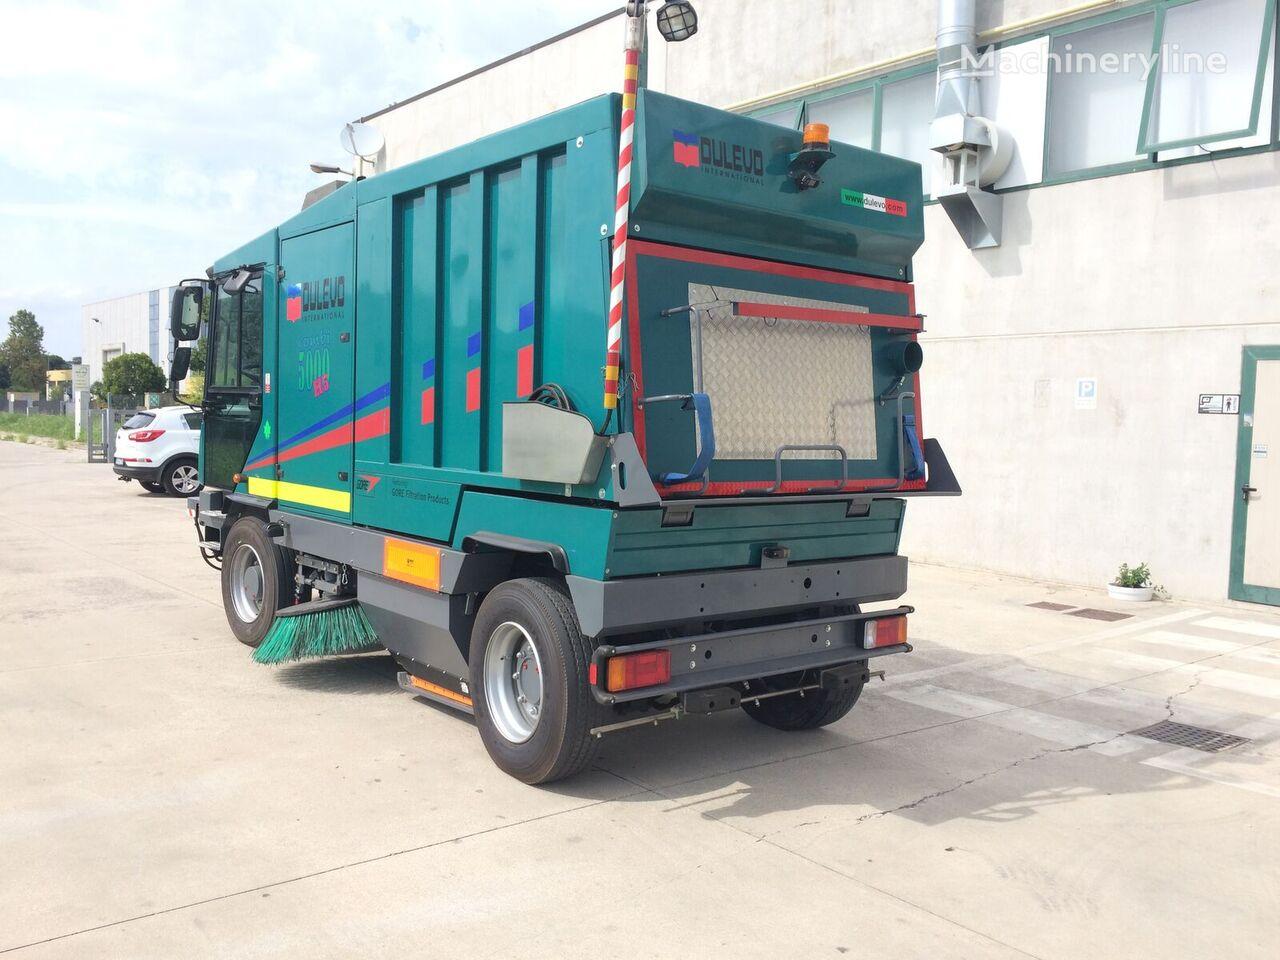 DULEVO 5000 COMBI road sweeper